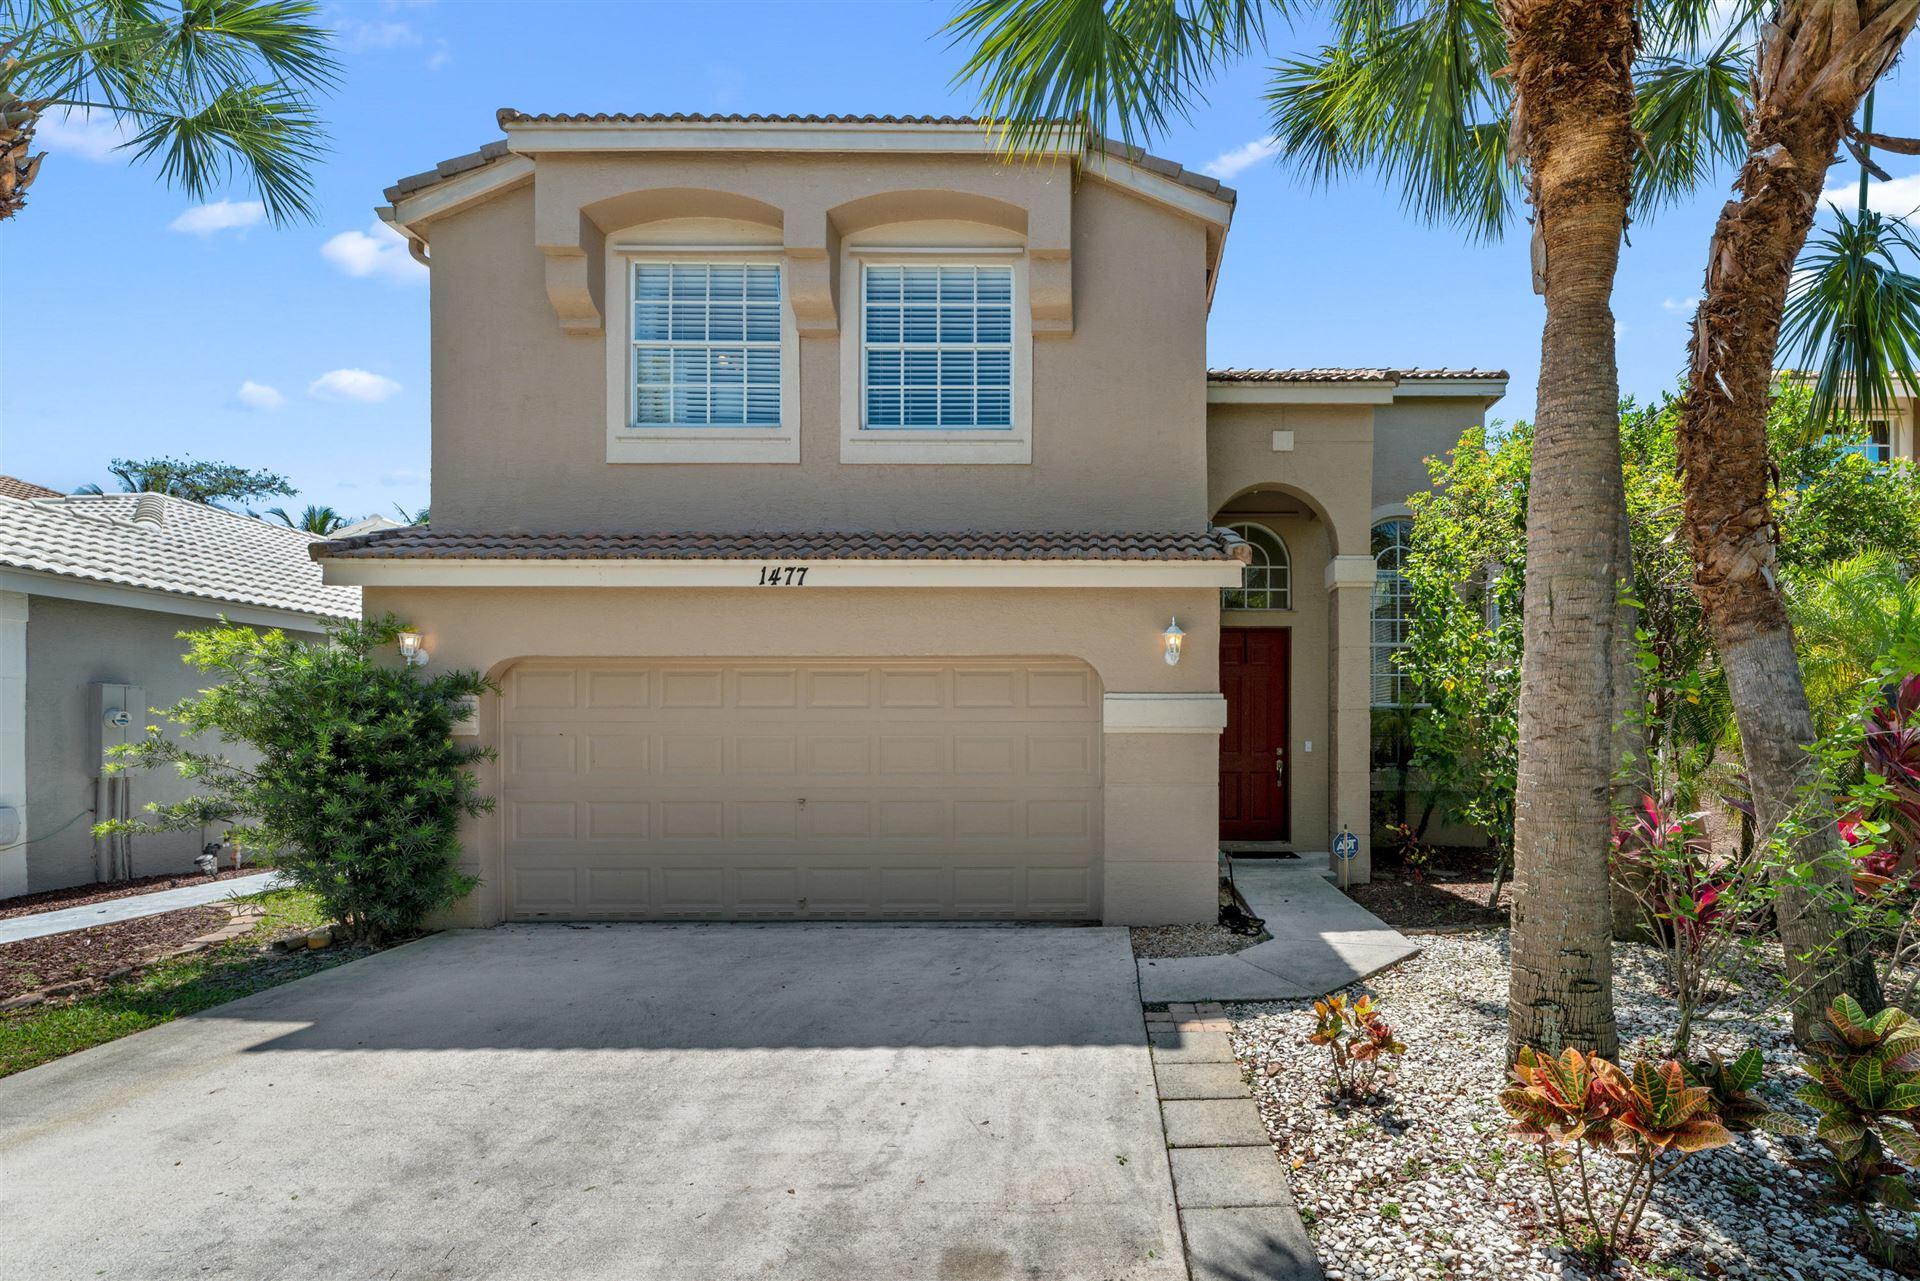 1477 Running Oak Lane, Royal Palm Beach, FL 33411 - #: RX-10619029